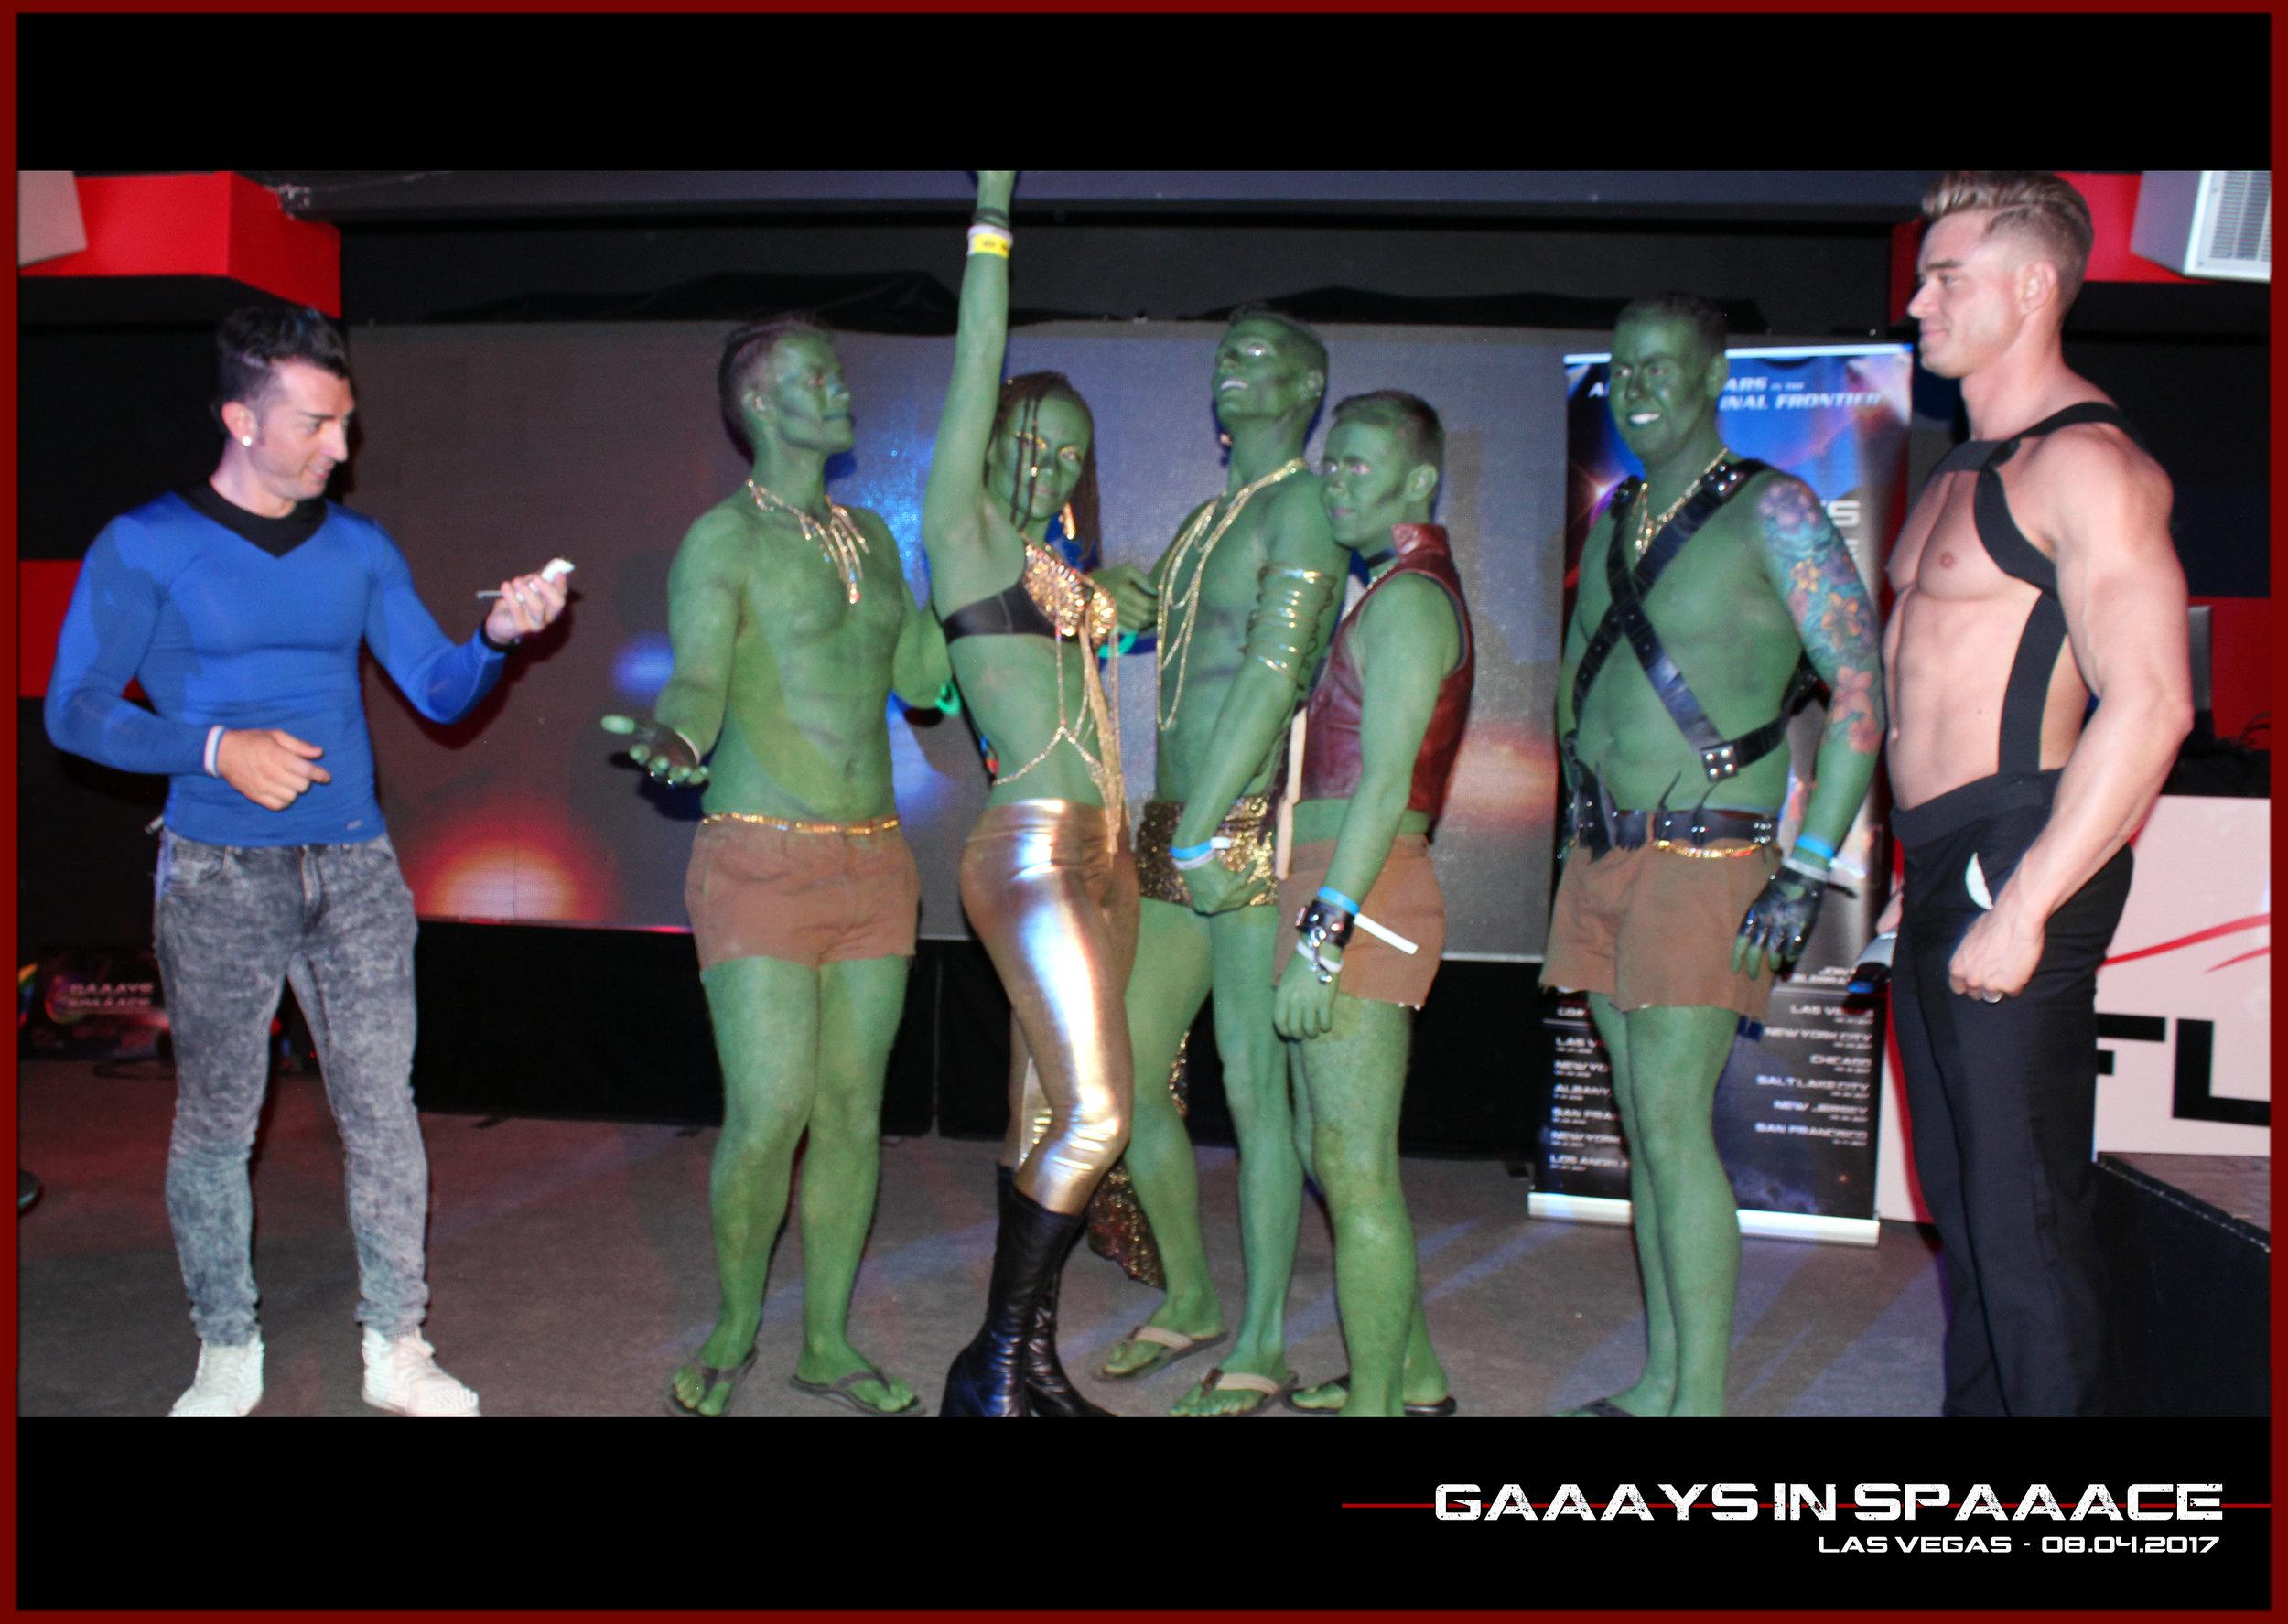 52-GIS-VEGAS-8-4-17-TheOrionSlaveBoys-JimmyDurano-ChazVorrias-on-Stage-2.jpg